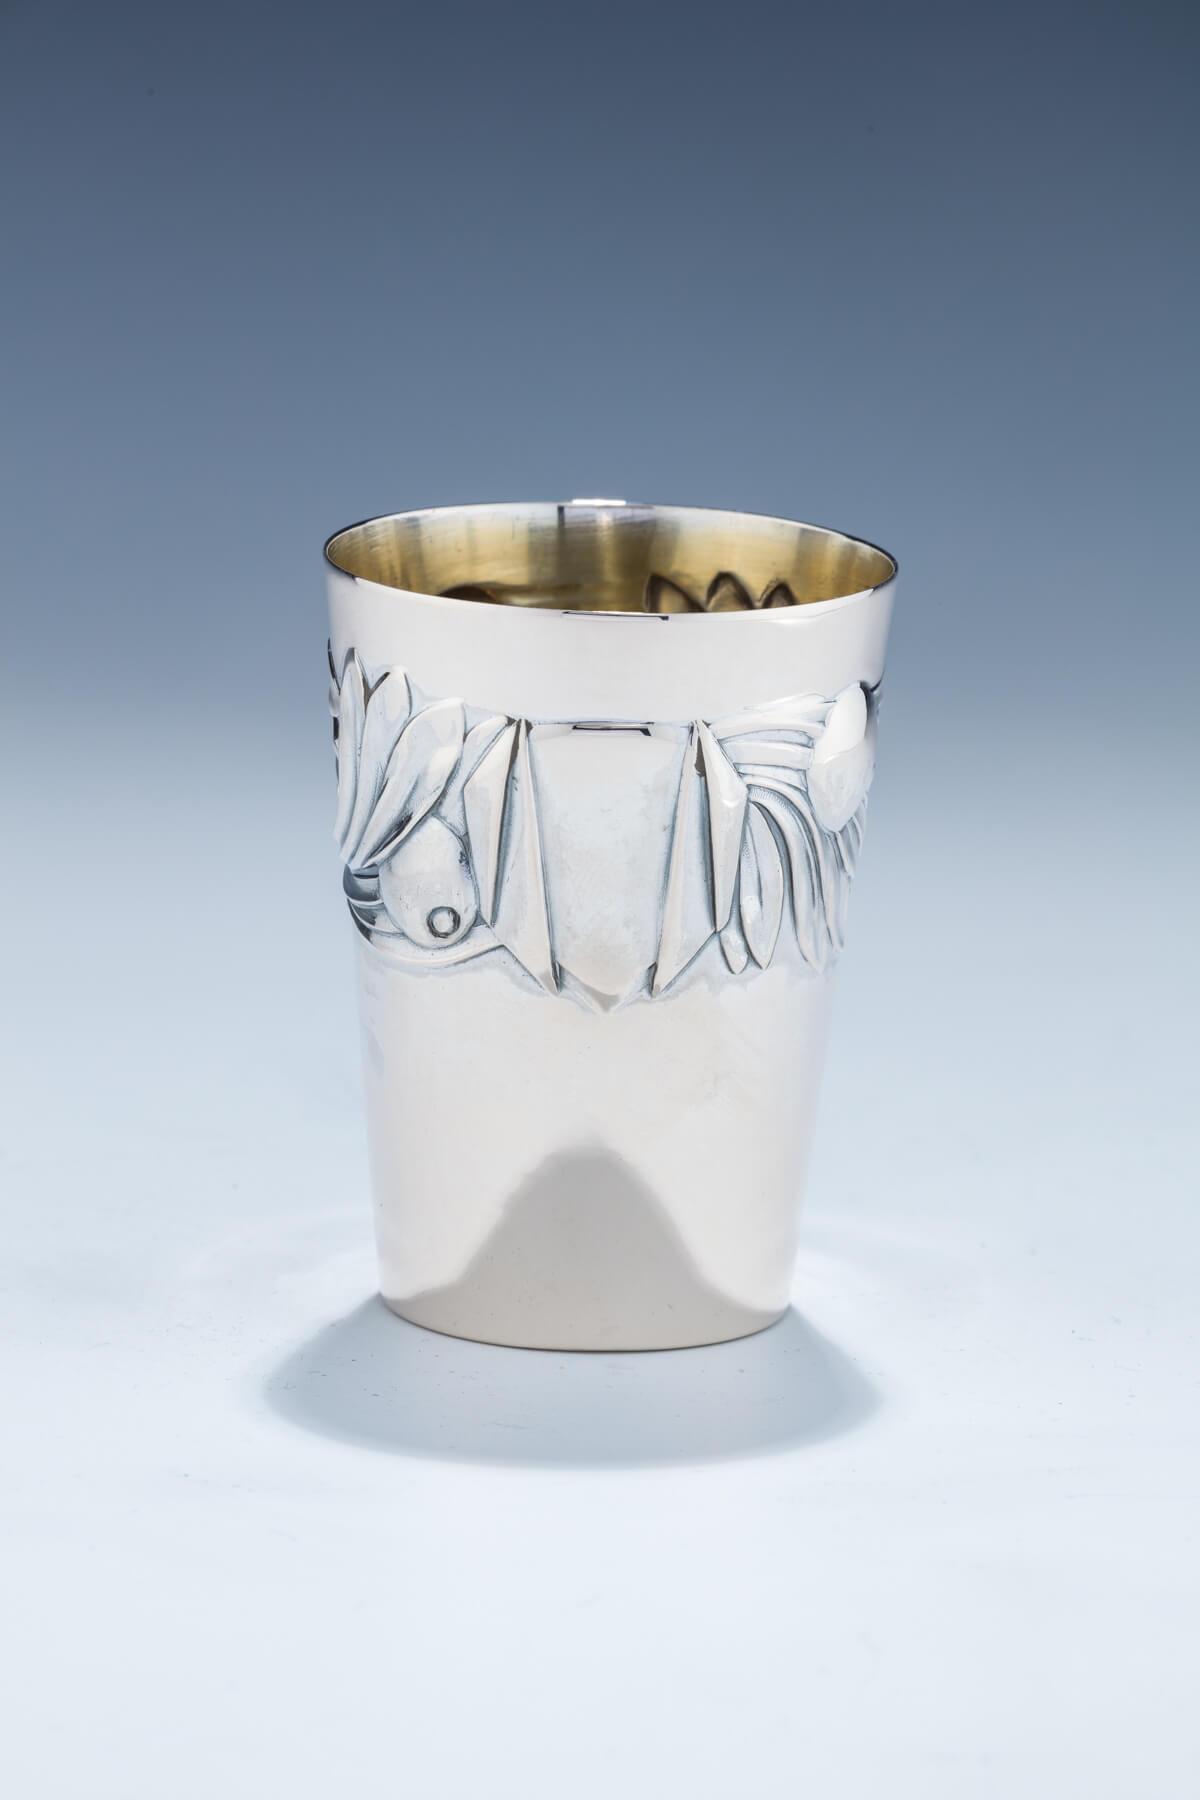 35. A Silver Beaker by Lazarus Posen